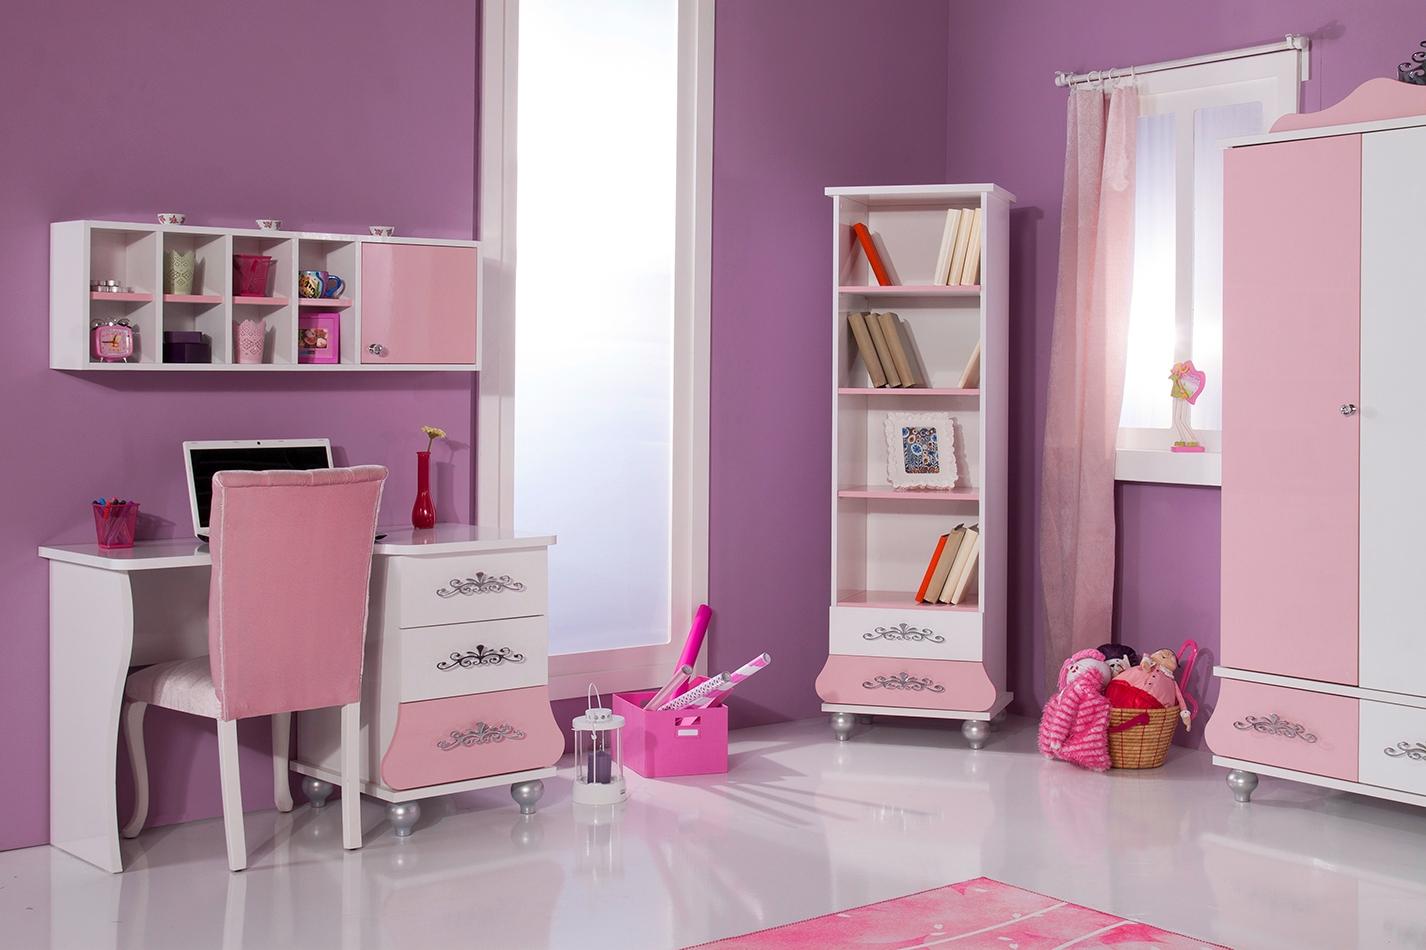 Full Size of Kinderzimmer Prinzessin Prestige Anastasia Mdchenzimmer Rosa 8 Regal Sofa Bett Weiß Prinzessinen Regale Kinderzimmer Kinderzimmer Prinzessin